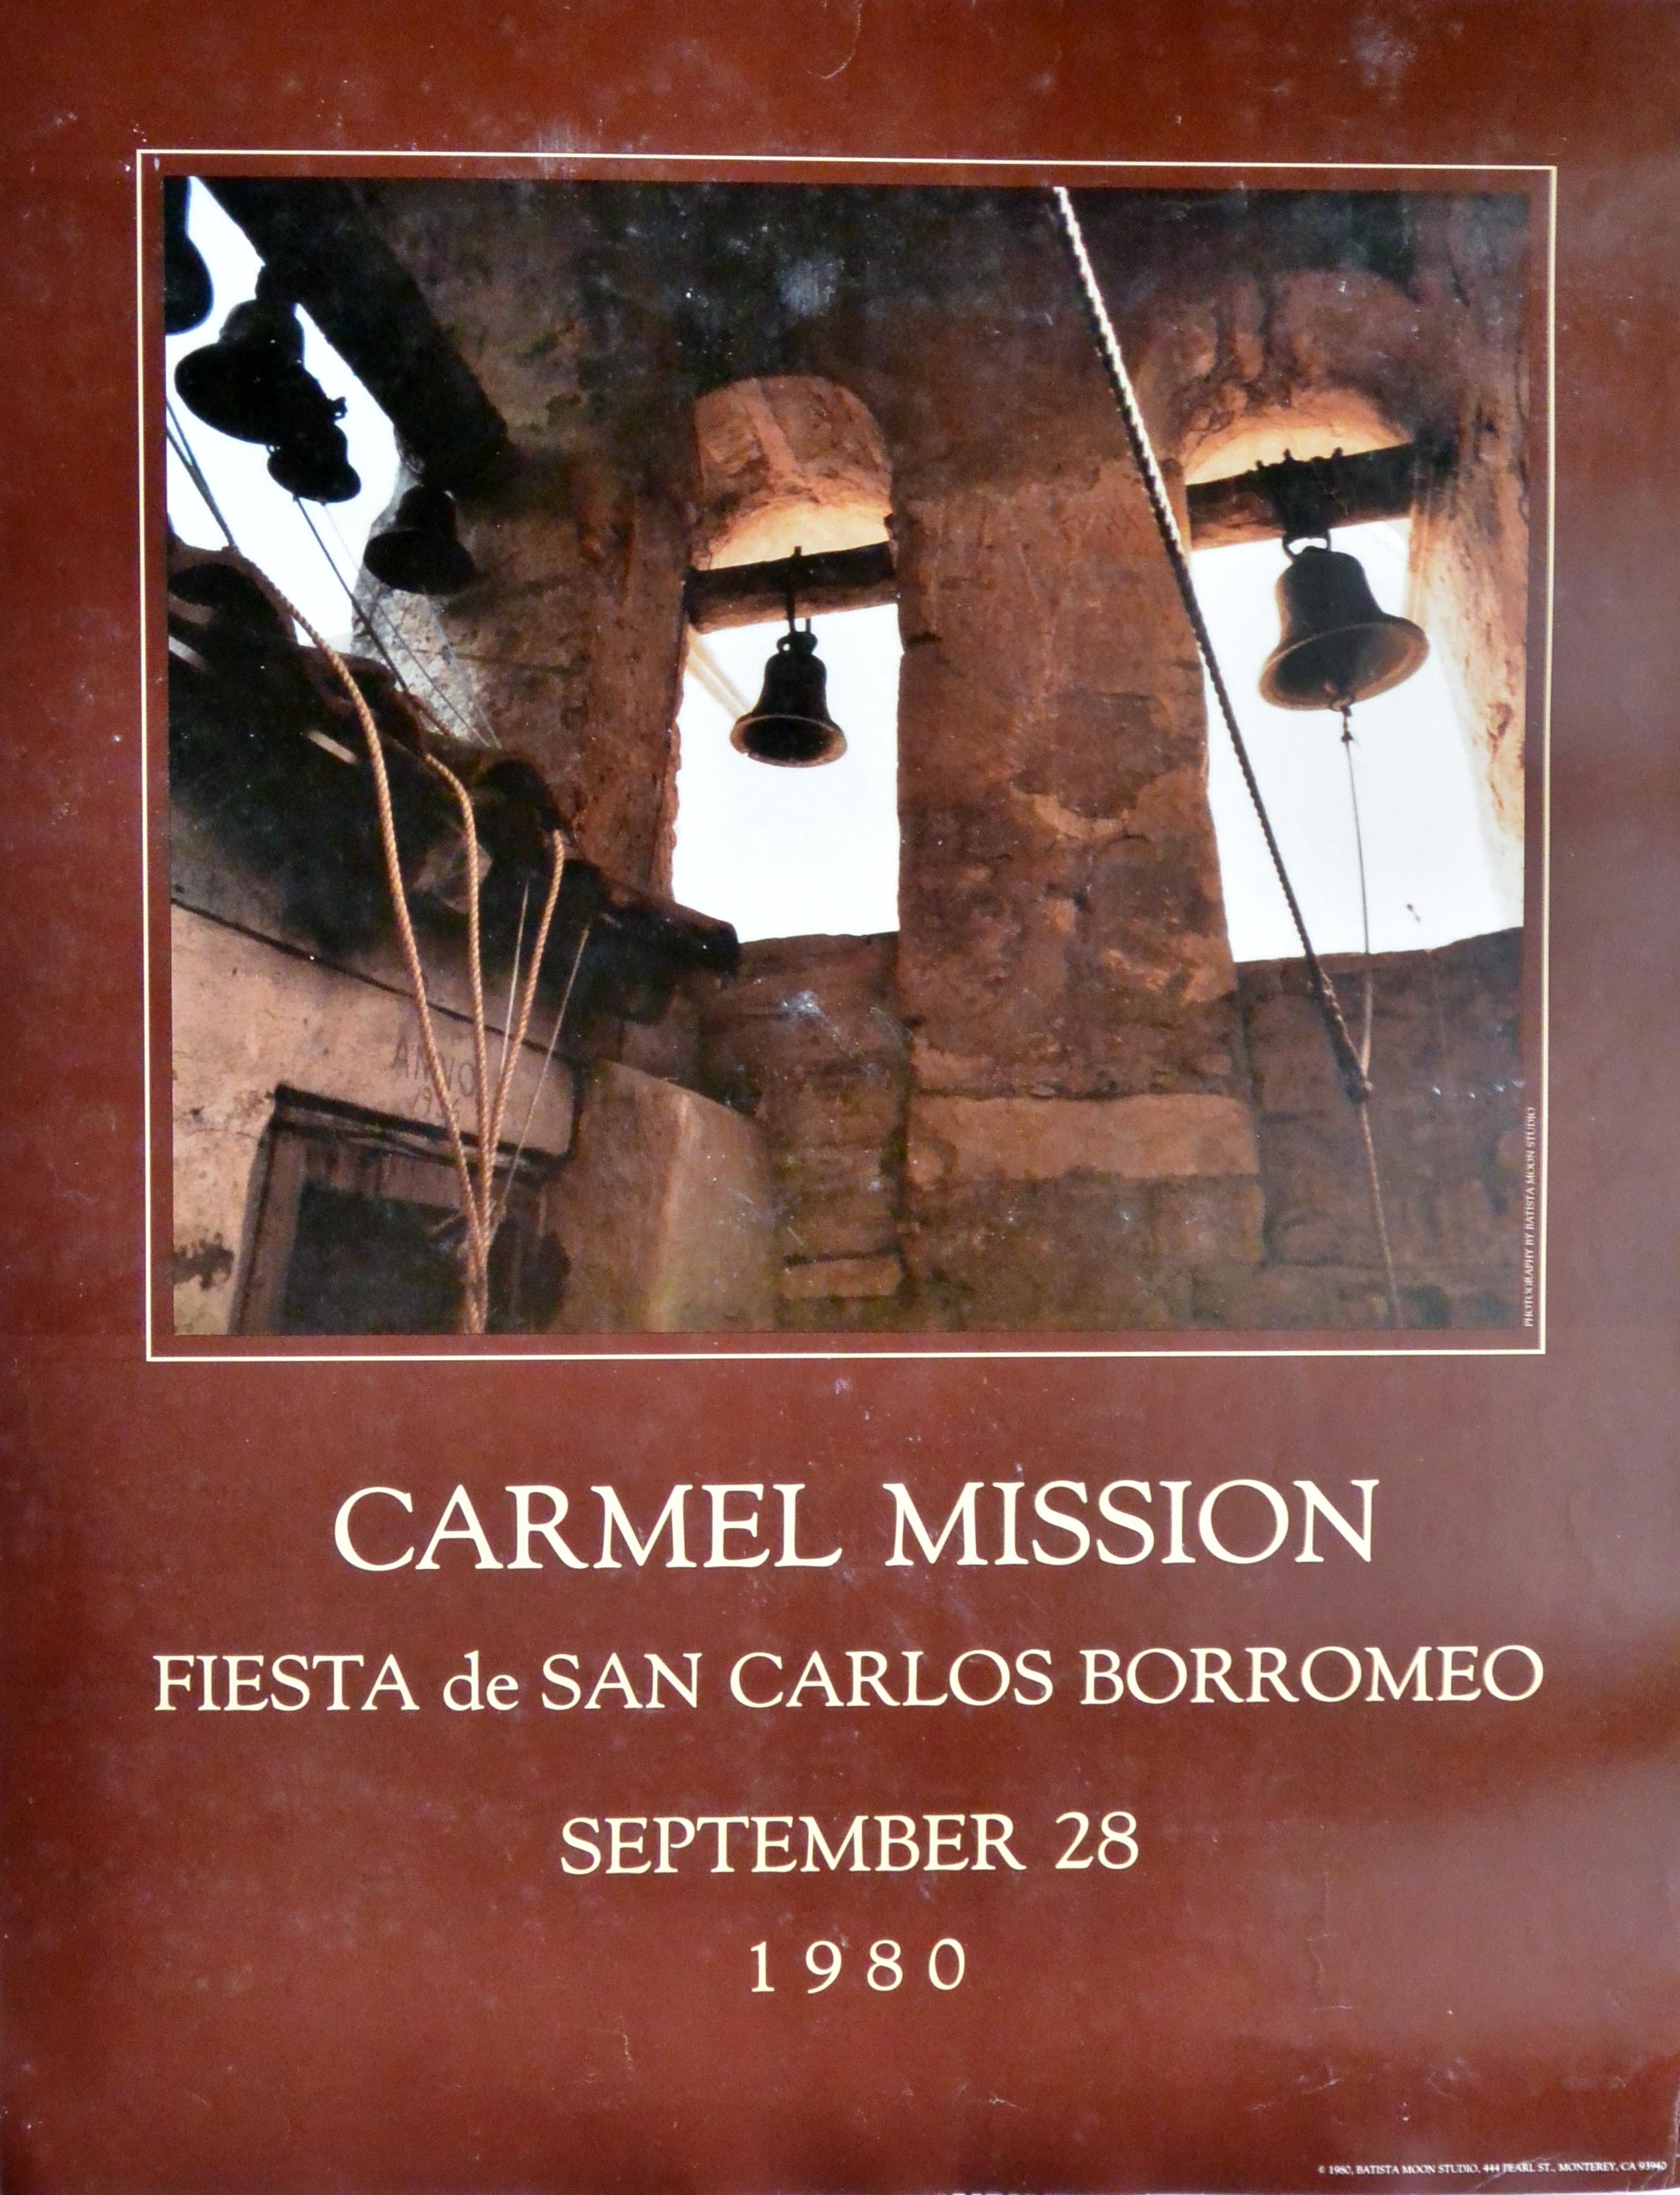 Carmel mission fiesta de san carlos borromeo cartel el marco verde obra gr fica posters - Almacenes san carlos ...